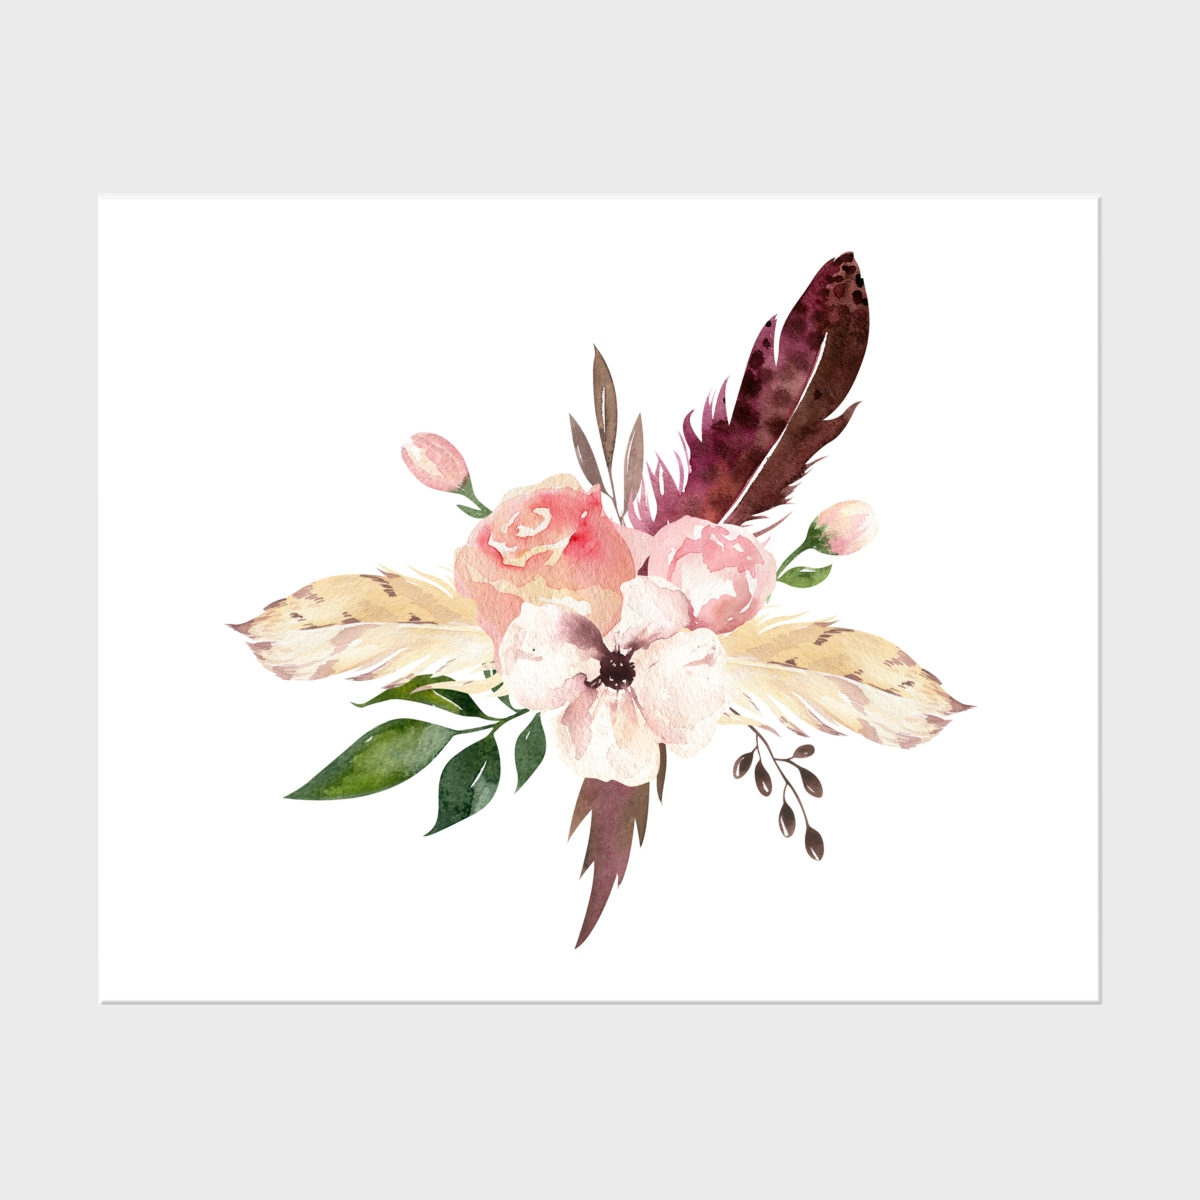 38. Floral (8)